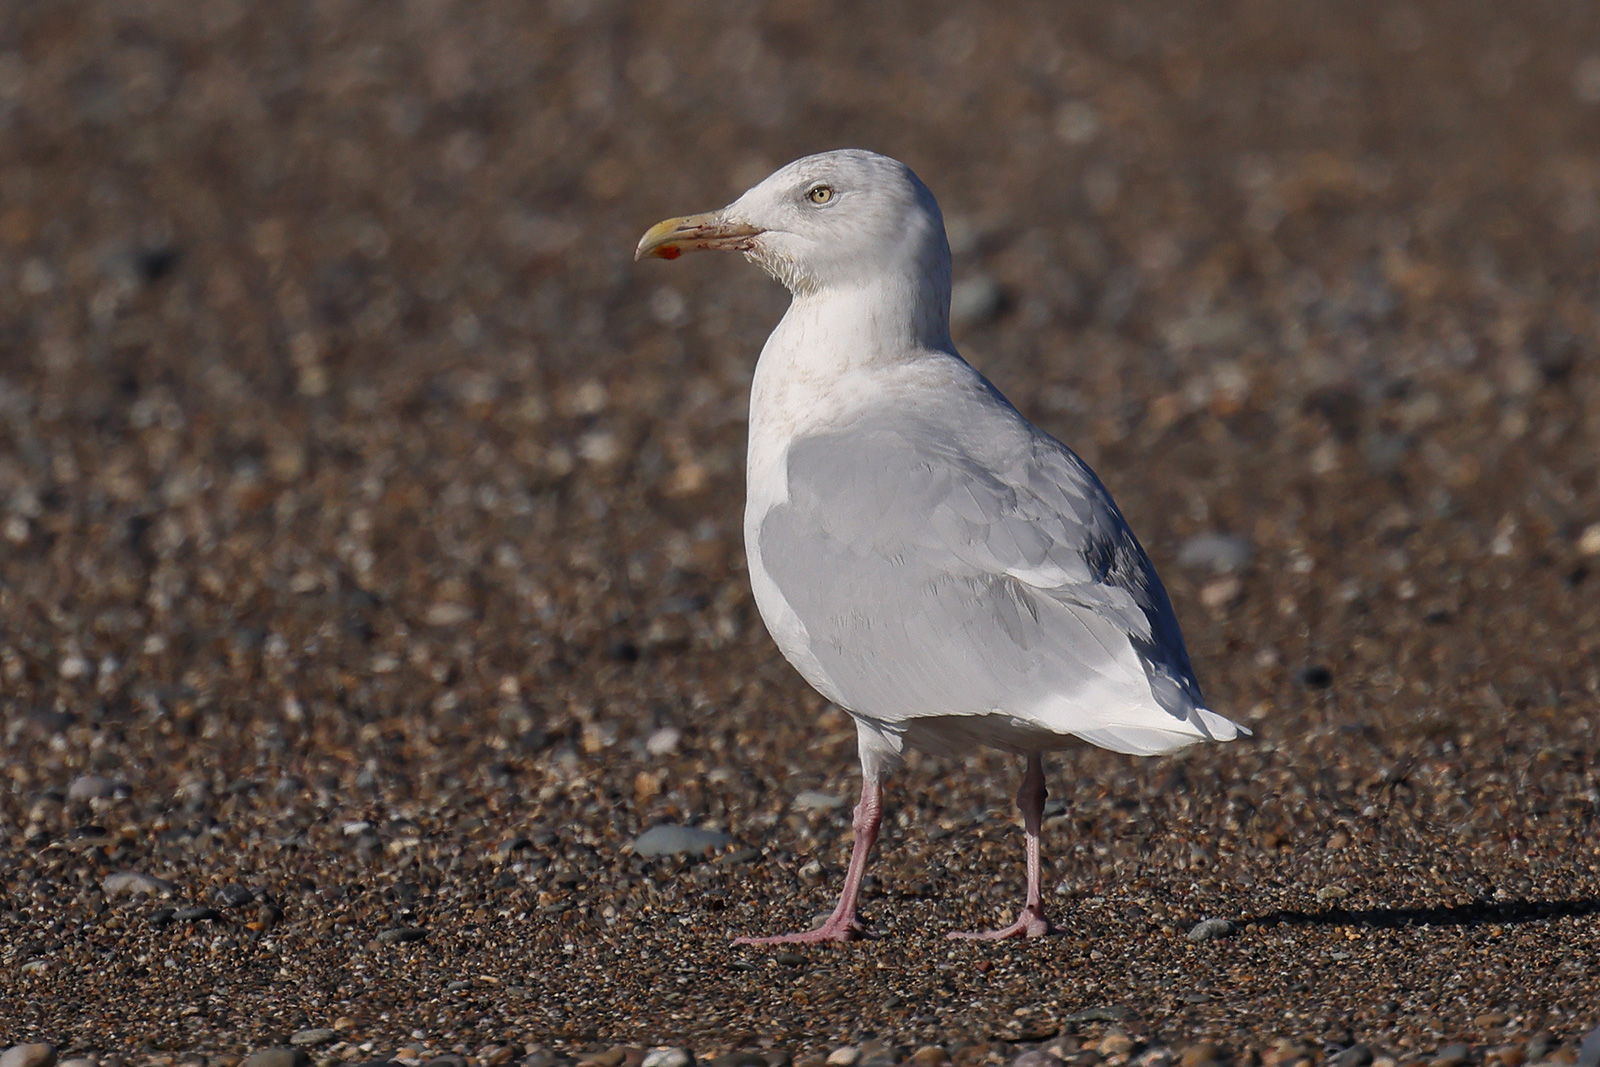 Glaucous Gull, Co. Wexford, Ireland.